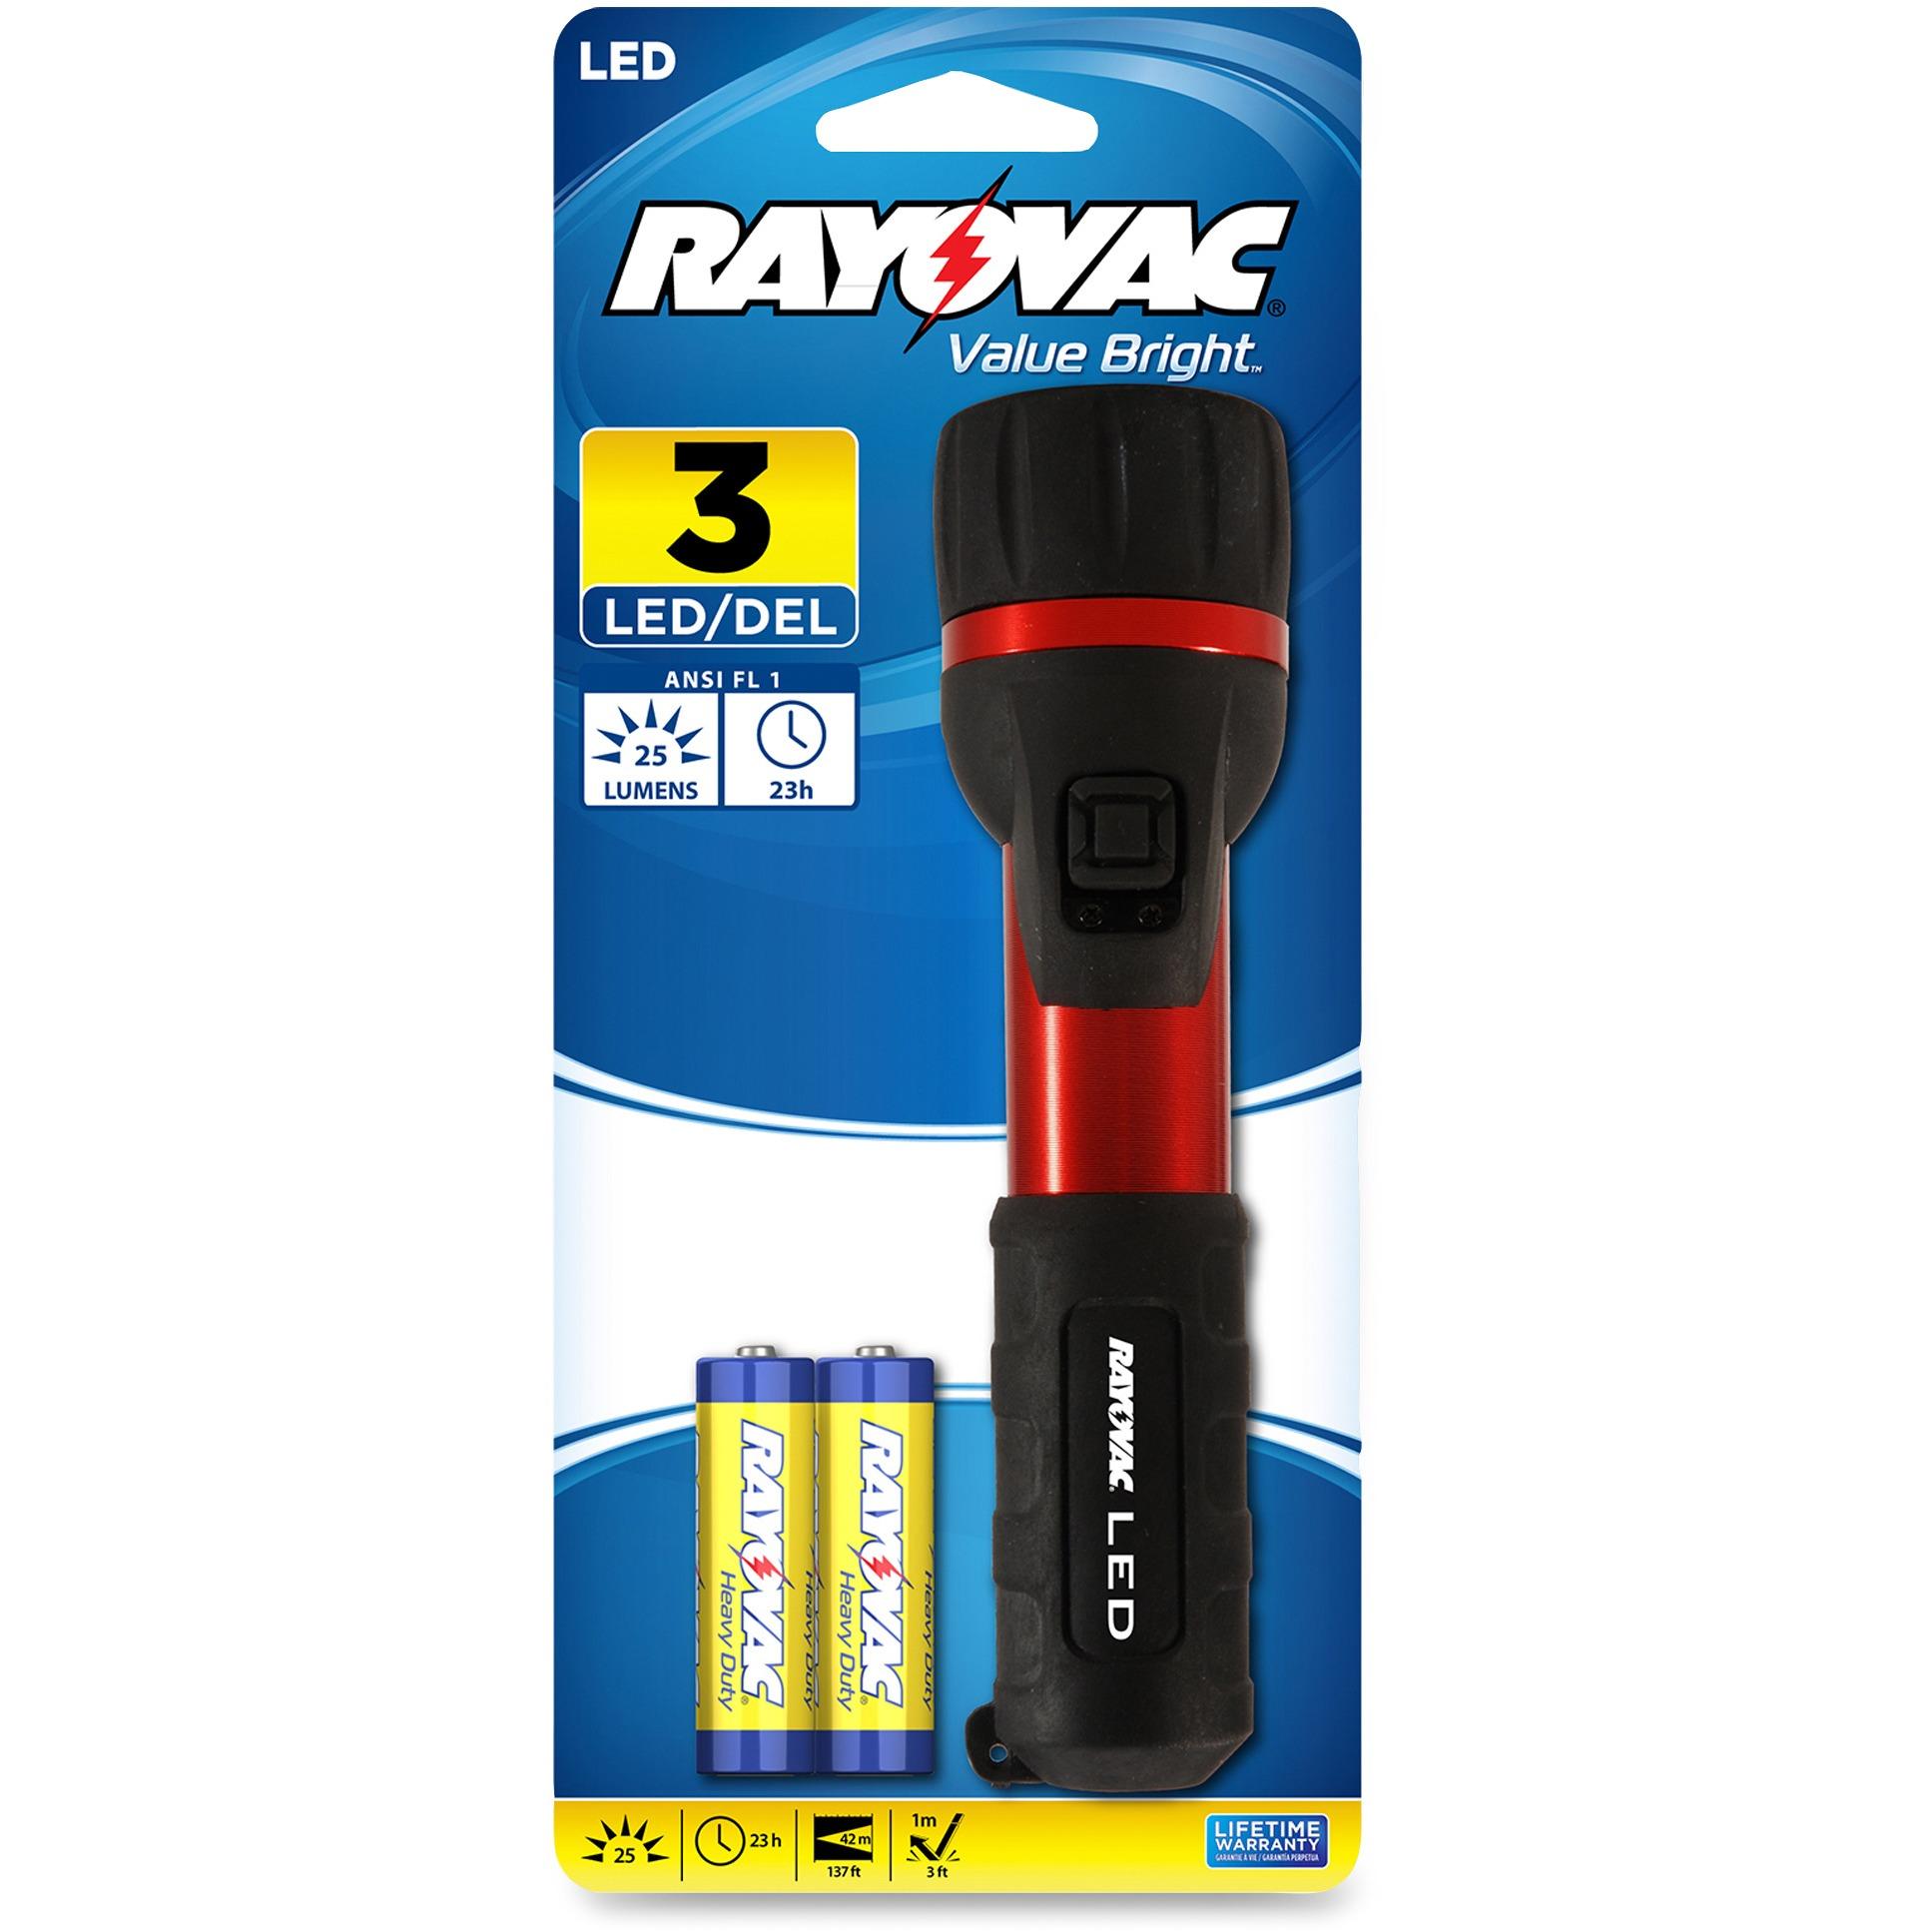 Rayovac 3 LED Flashlight 2 AA Batteries Included